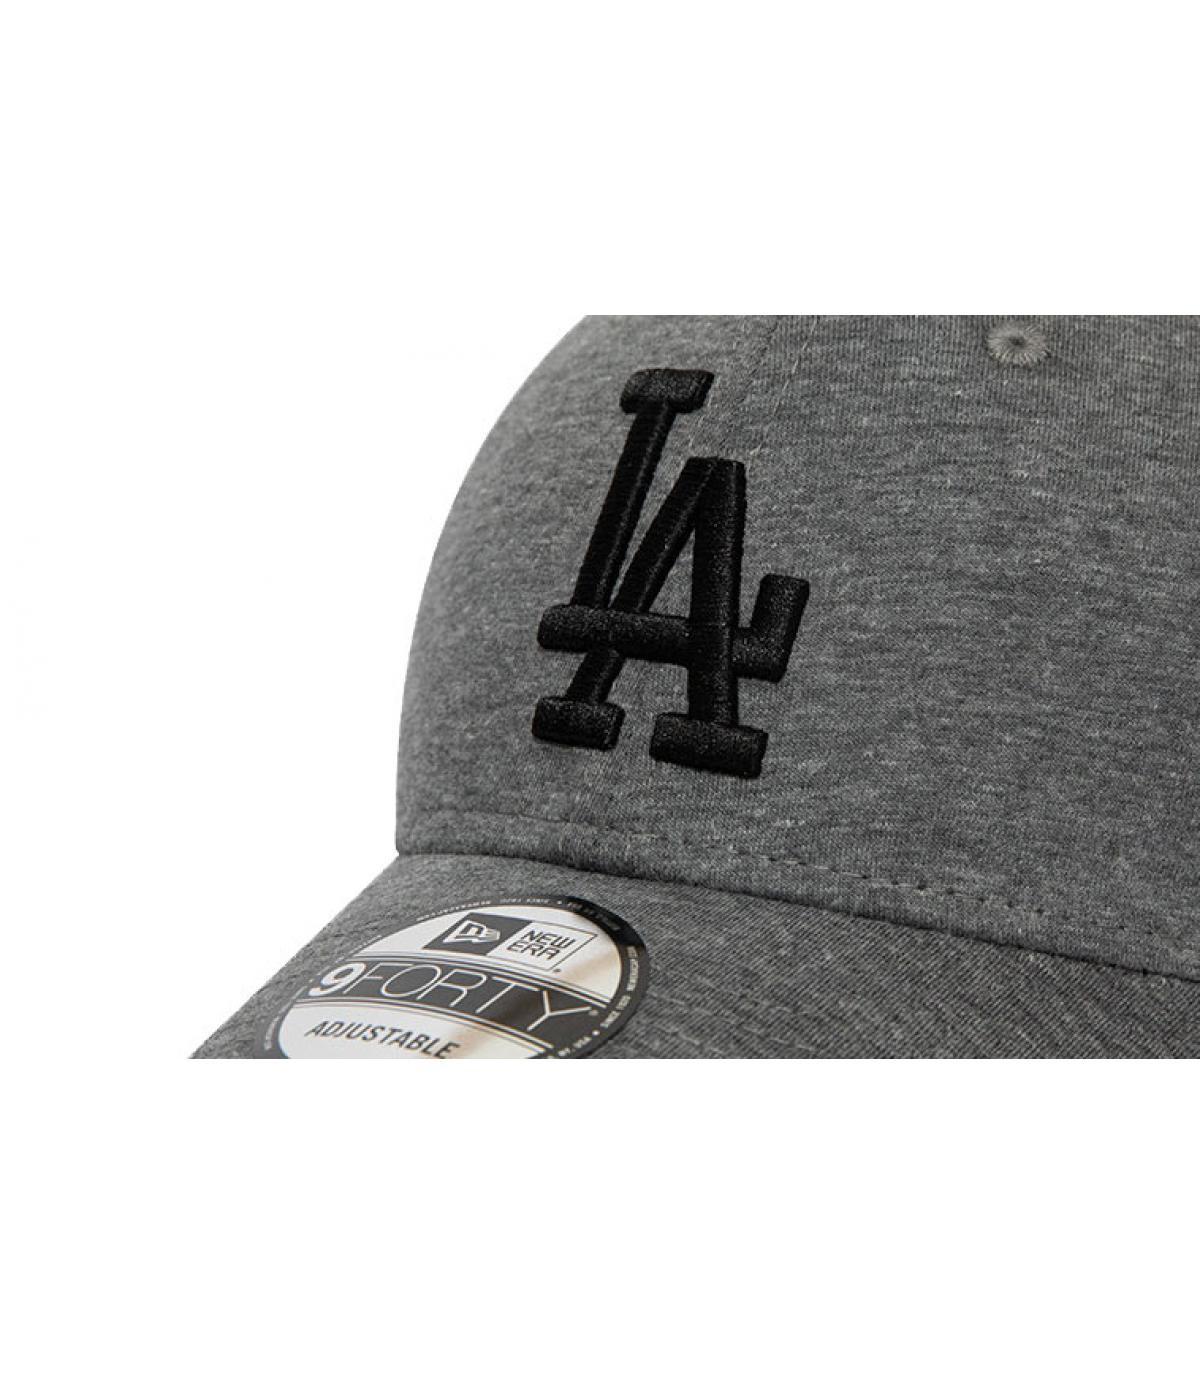 Details Jersey Ess LA 940 graphite - afbeeling 3